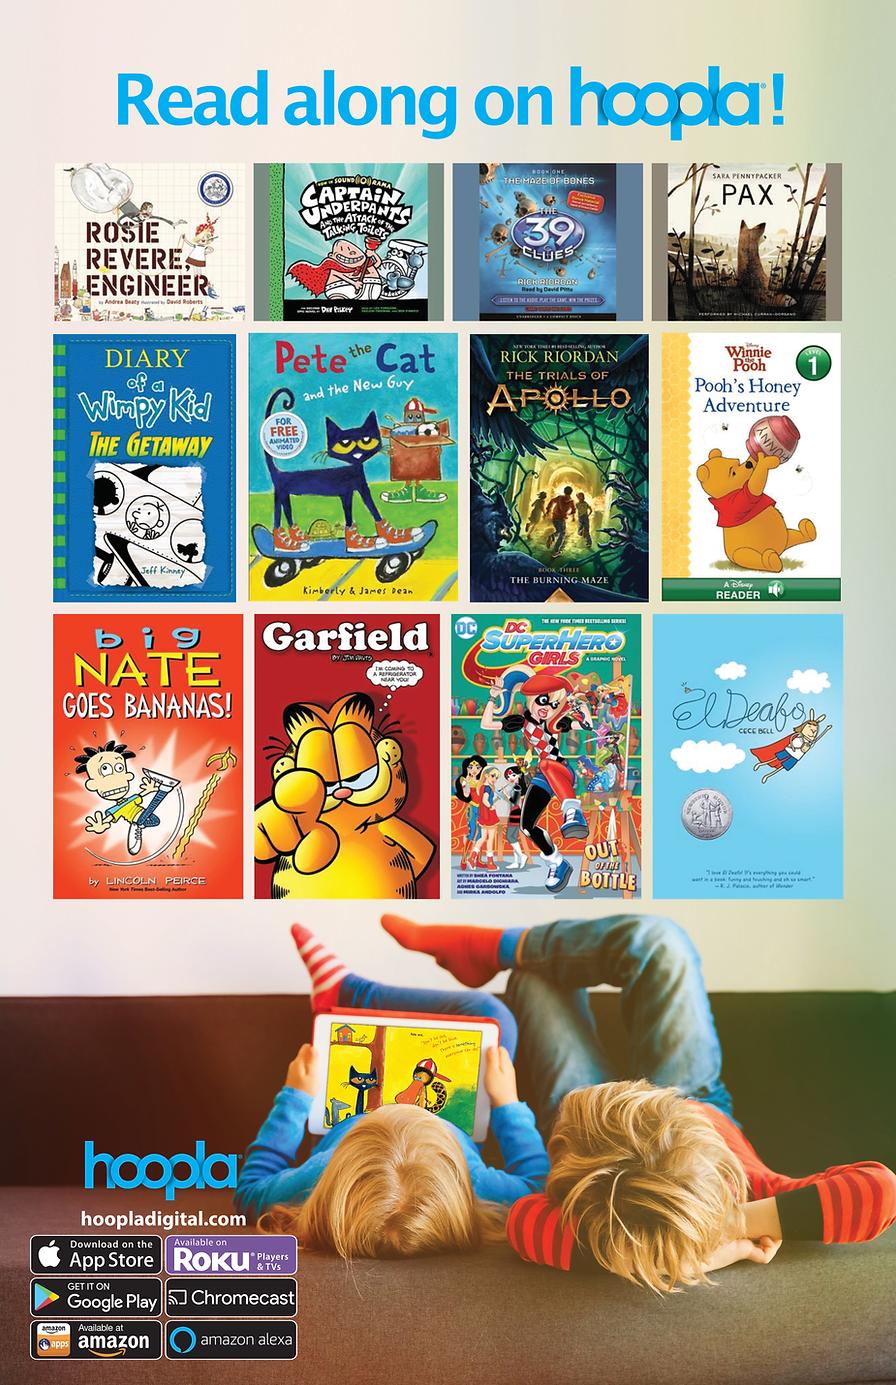 hoopla_awareness_book_childrens_poster.p